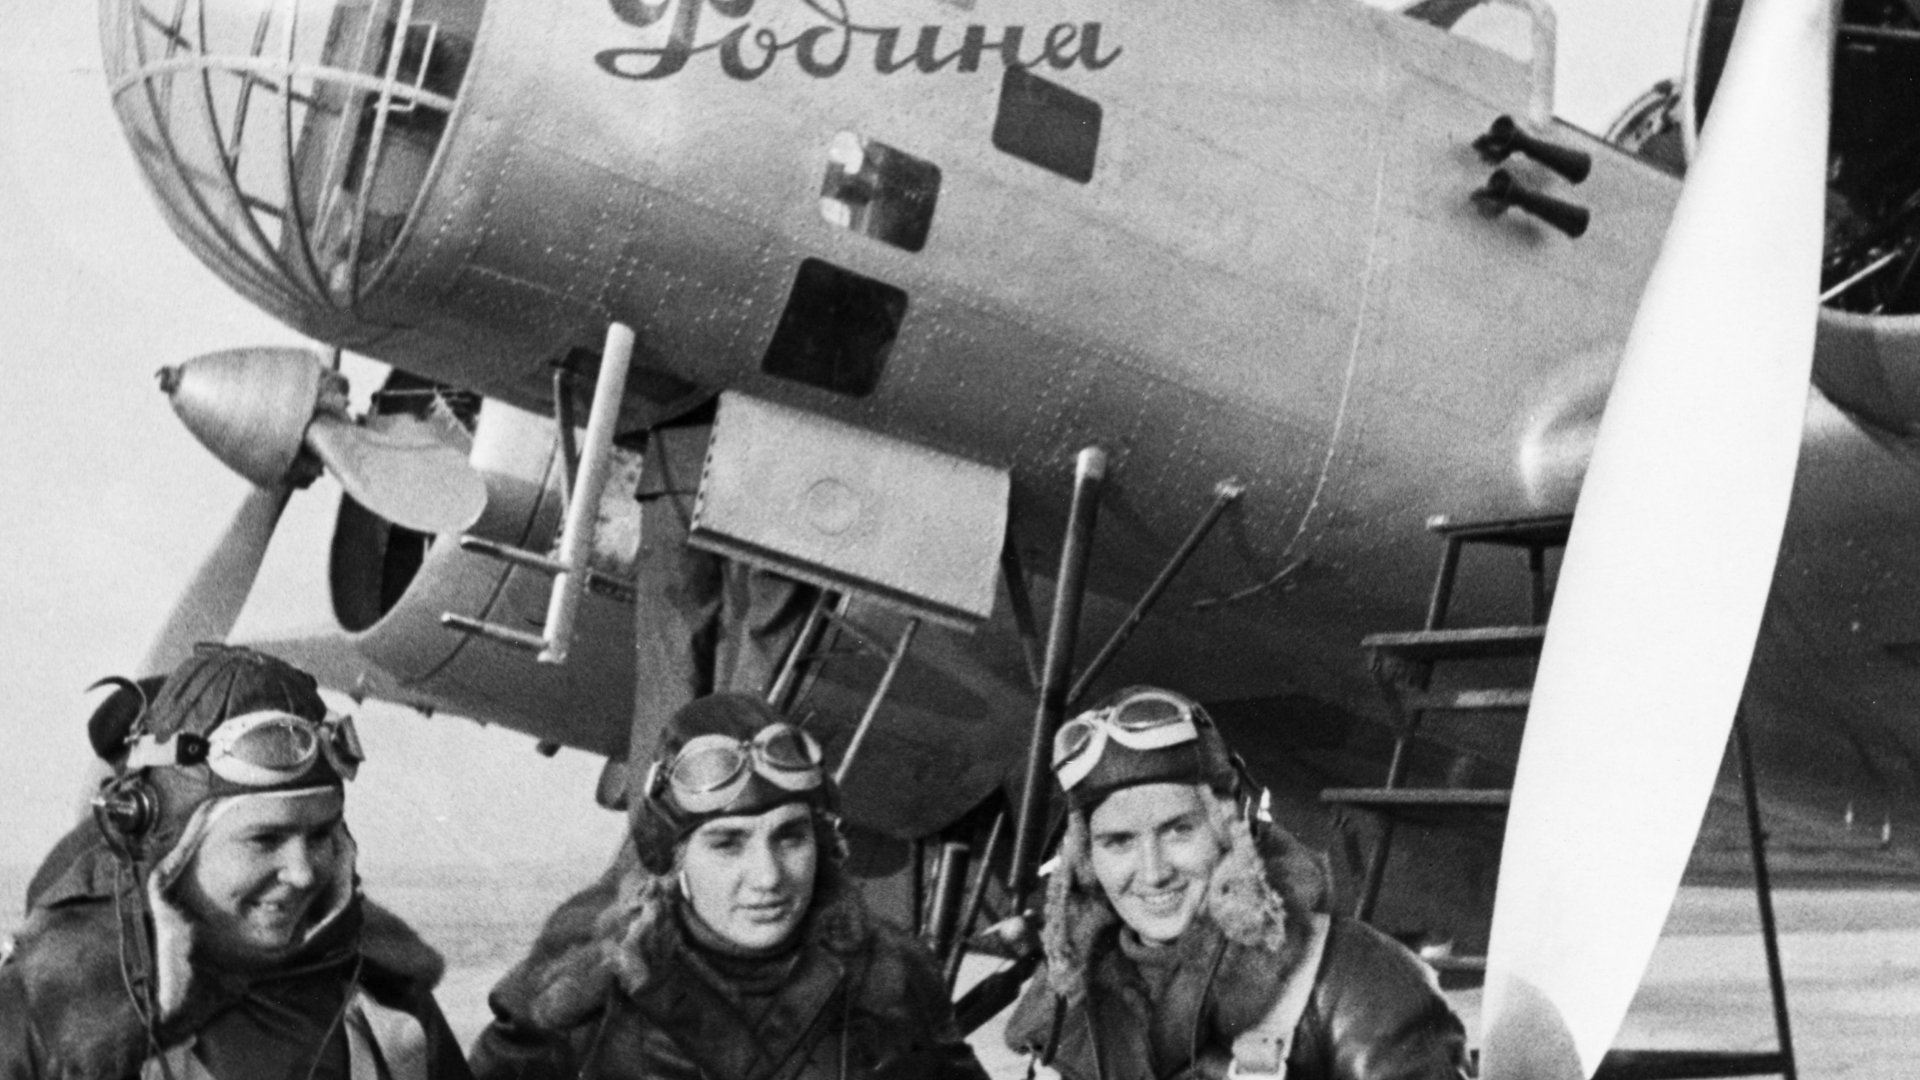 Captain Polina Osipenko (Co-Pilot and Commander of the plane), Deputy to the Supreme Soviet of the USSR Valentina Grizodubova (Navigator), and Senior Lieutenant Marina Raskova right before taking flight. (Credit: Sovfoto/UIG via Getty Images)